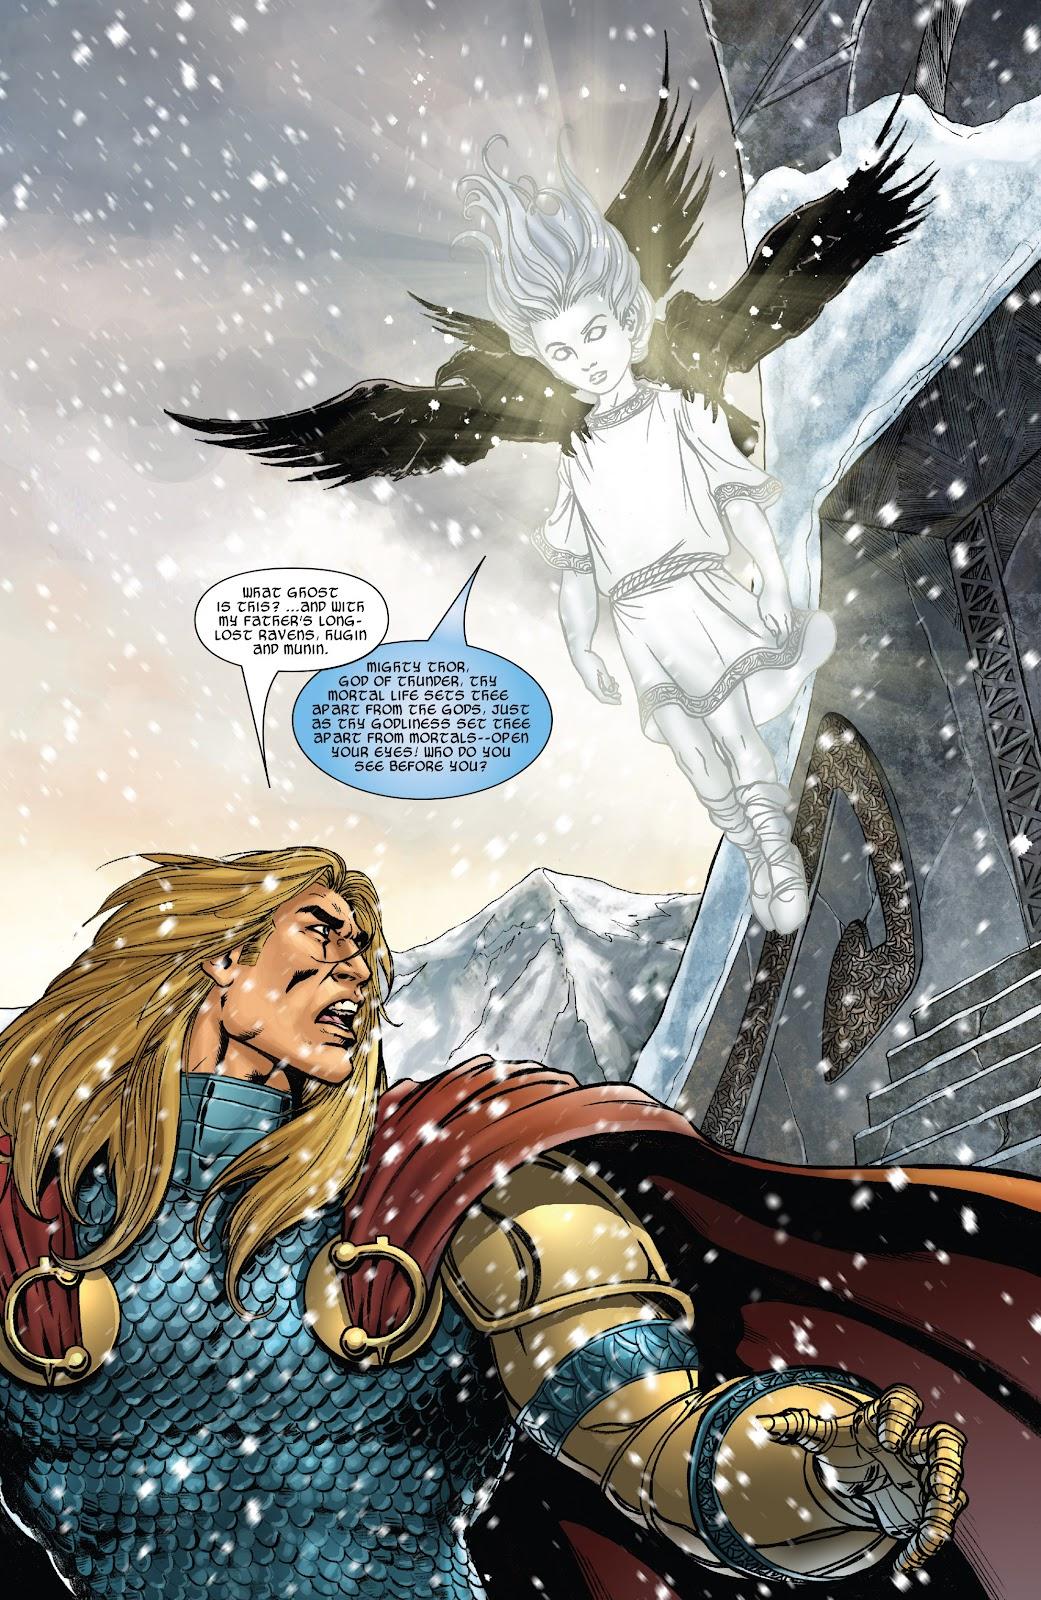 Read online Thor: Ragnaroks comic -  Issue # TPB (Part 3) - 8